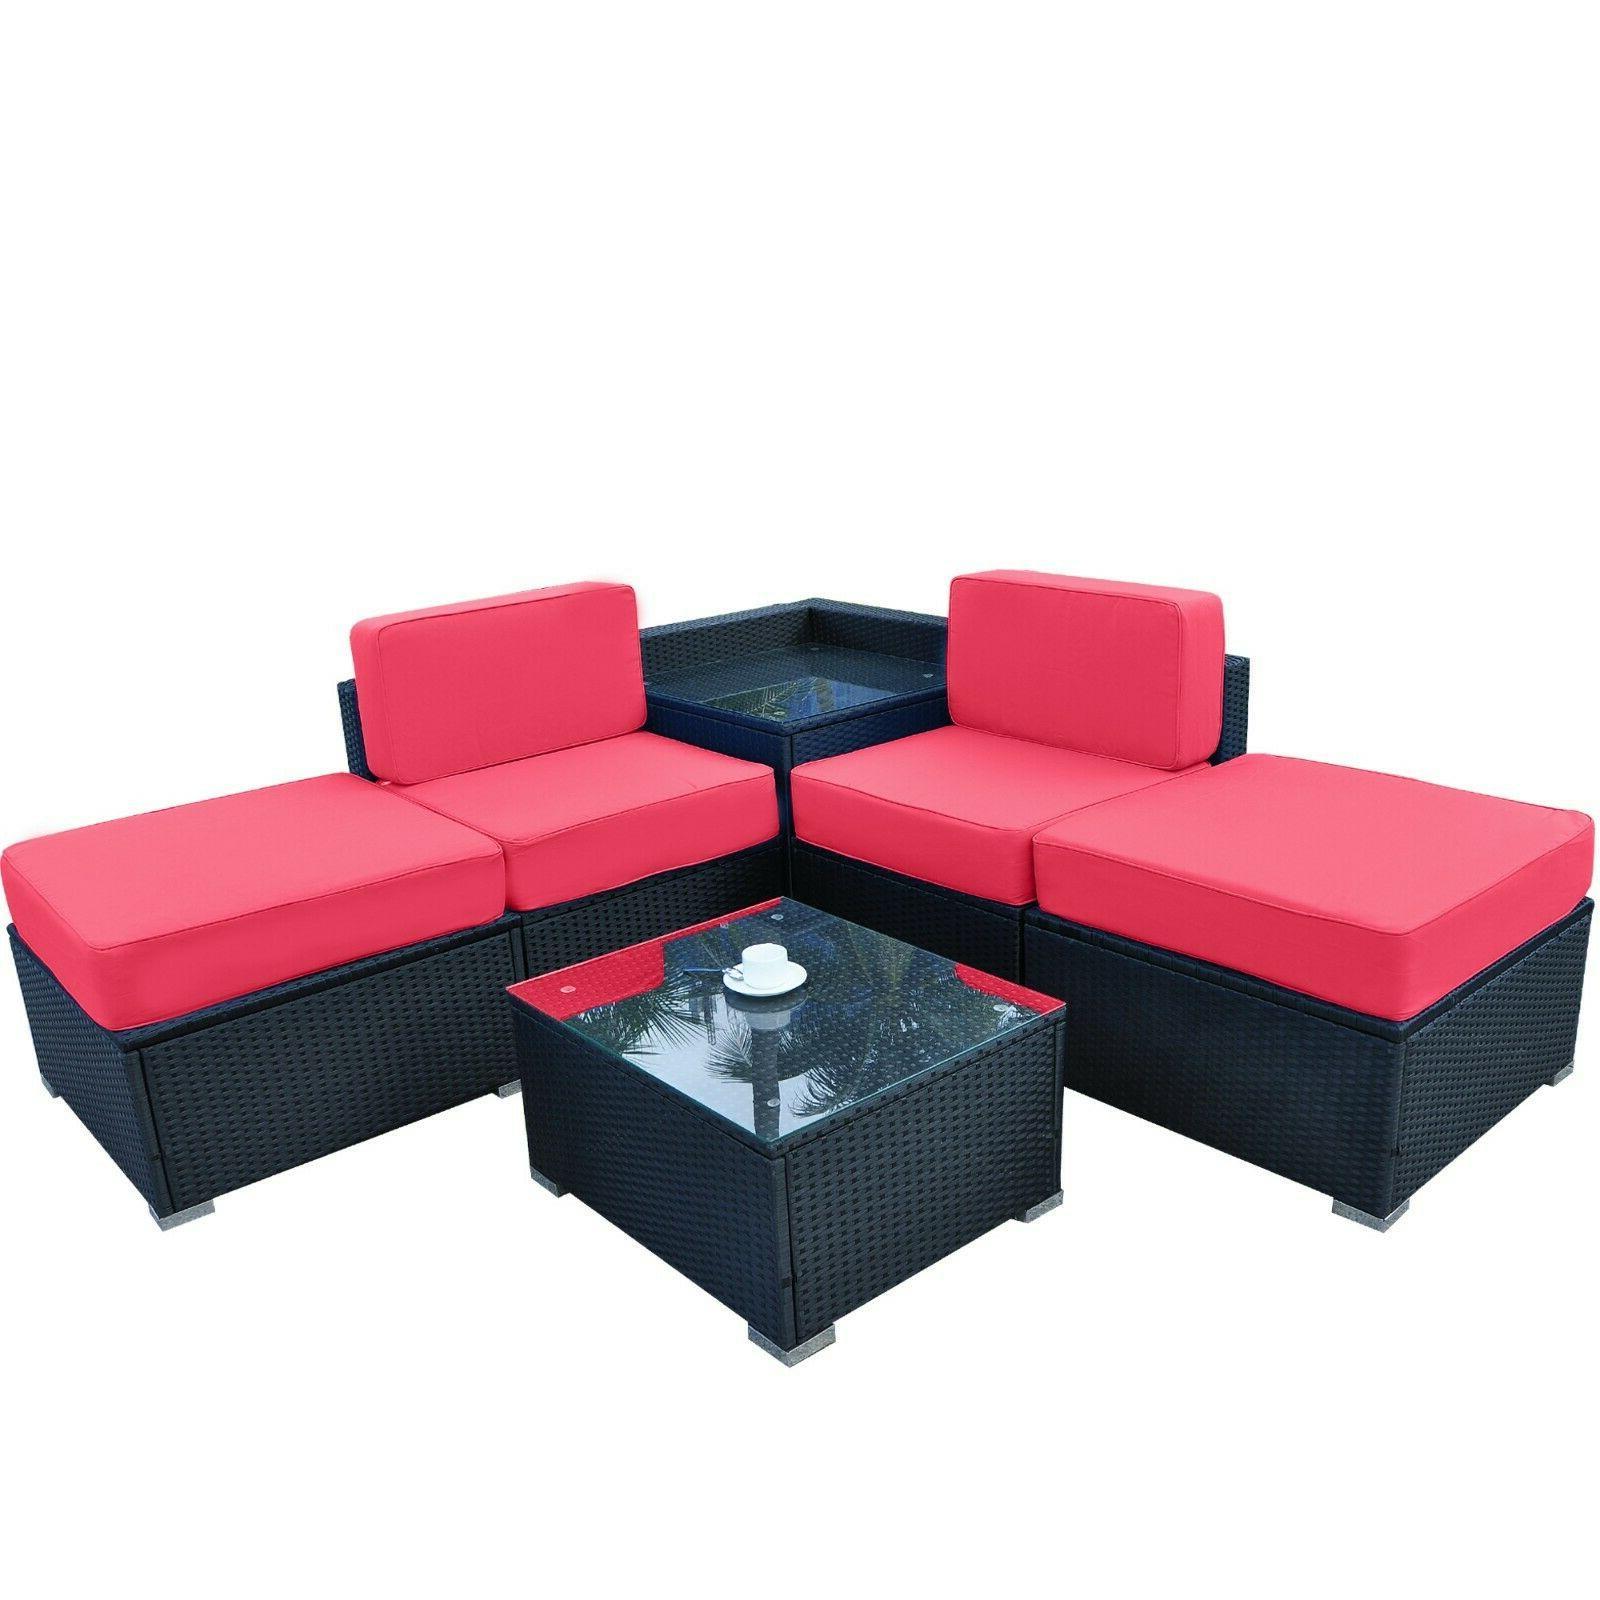 Mcombo Outdoor Wicker Rattan Sofa Sectional Furniture